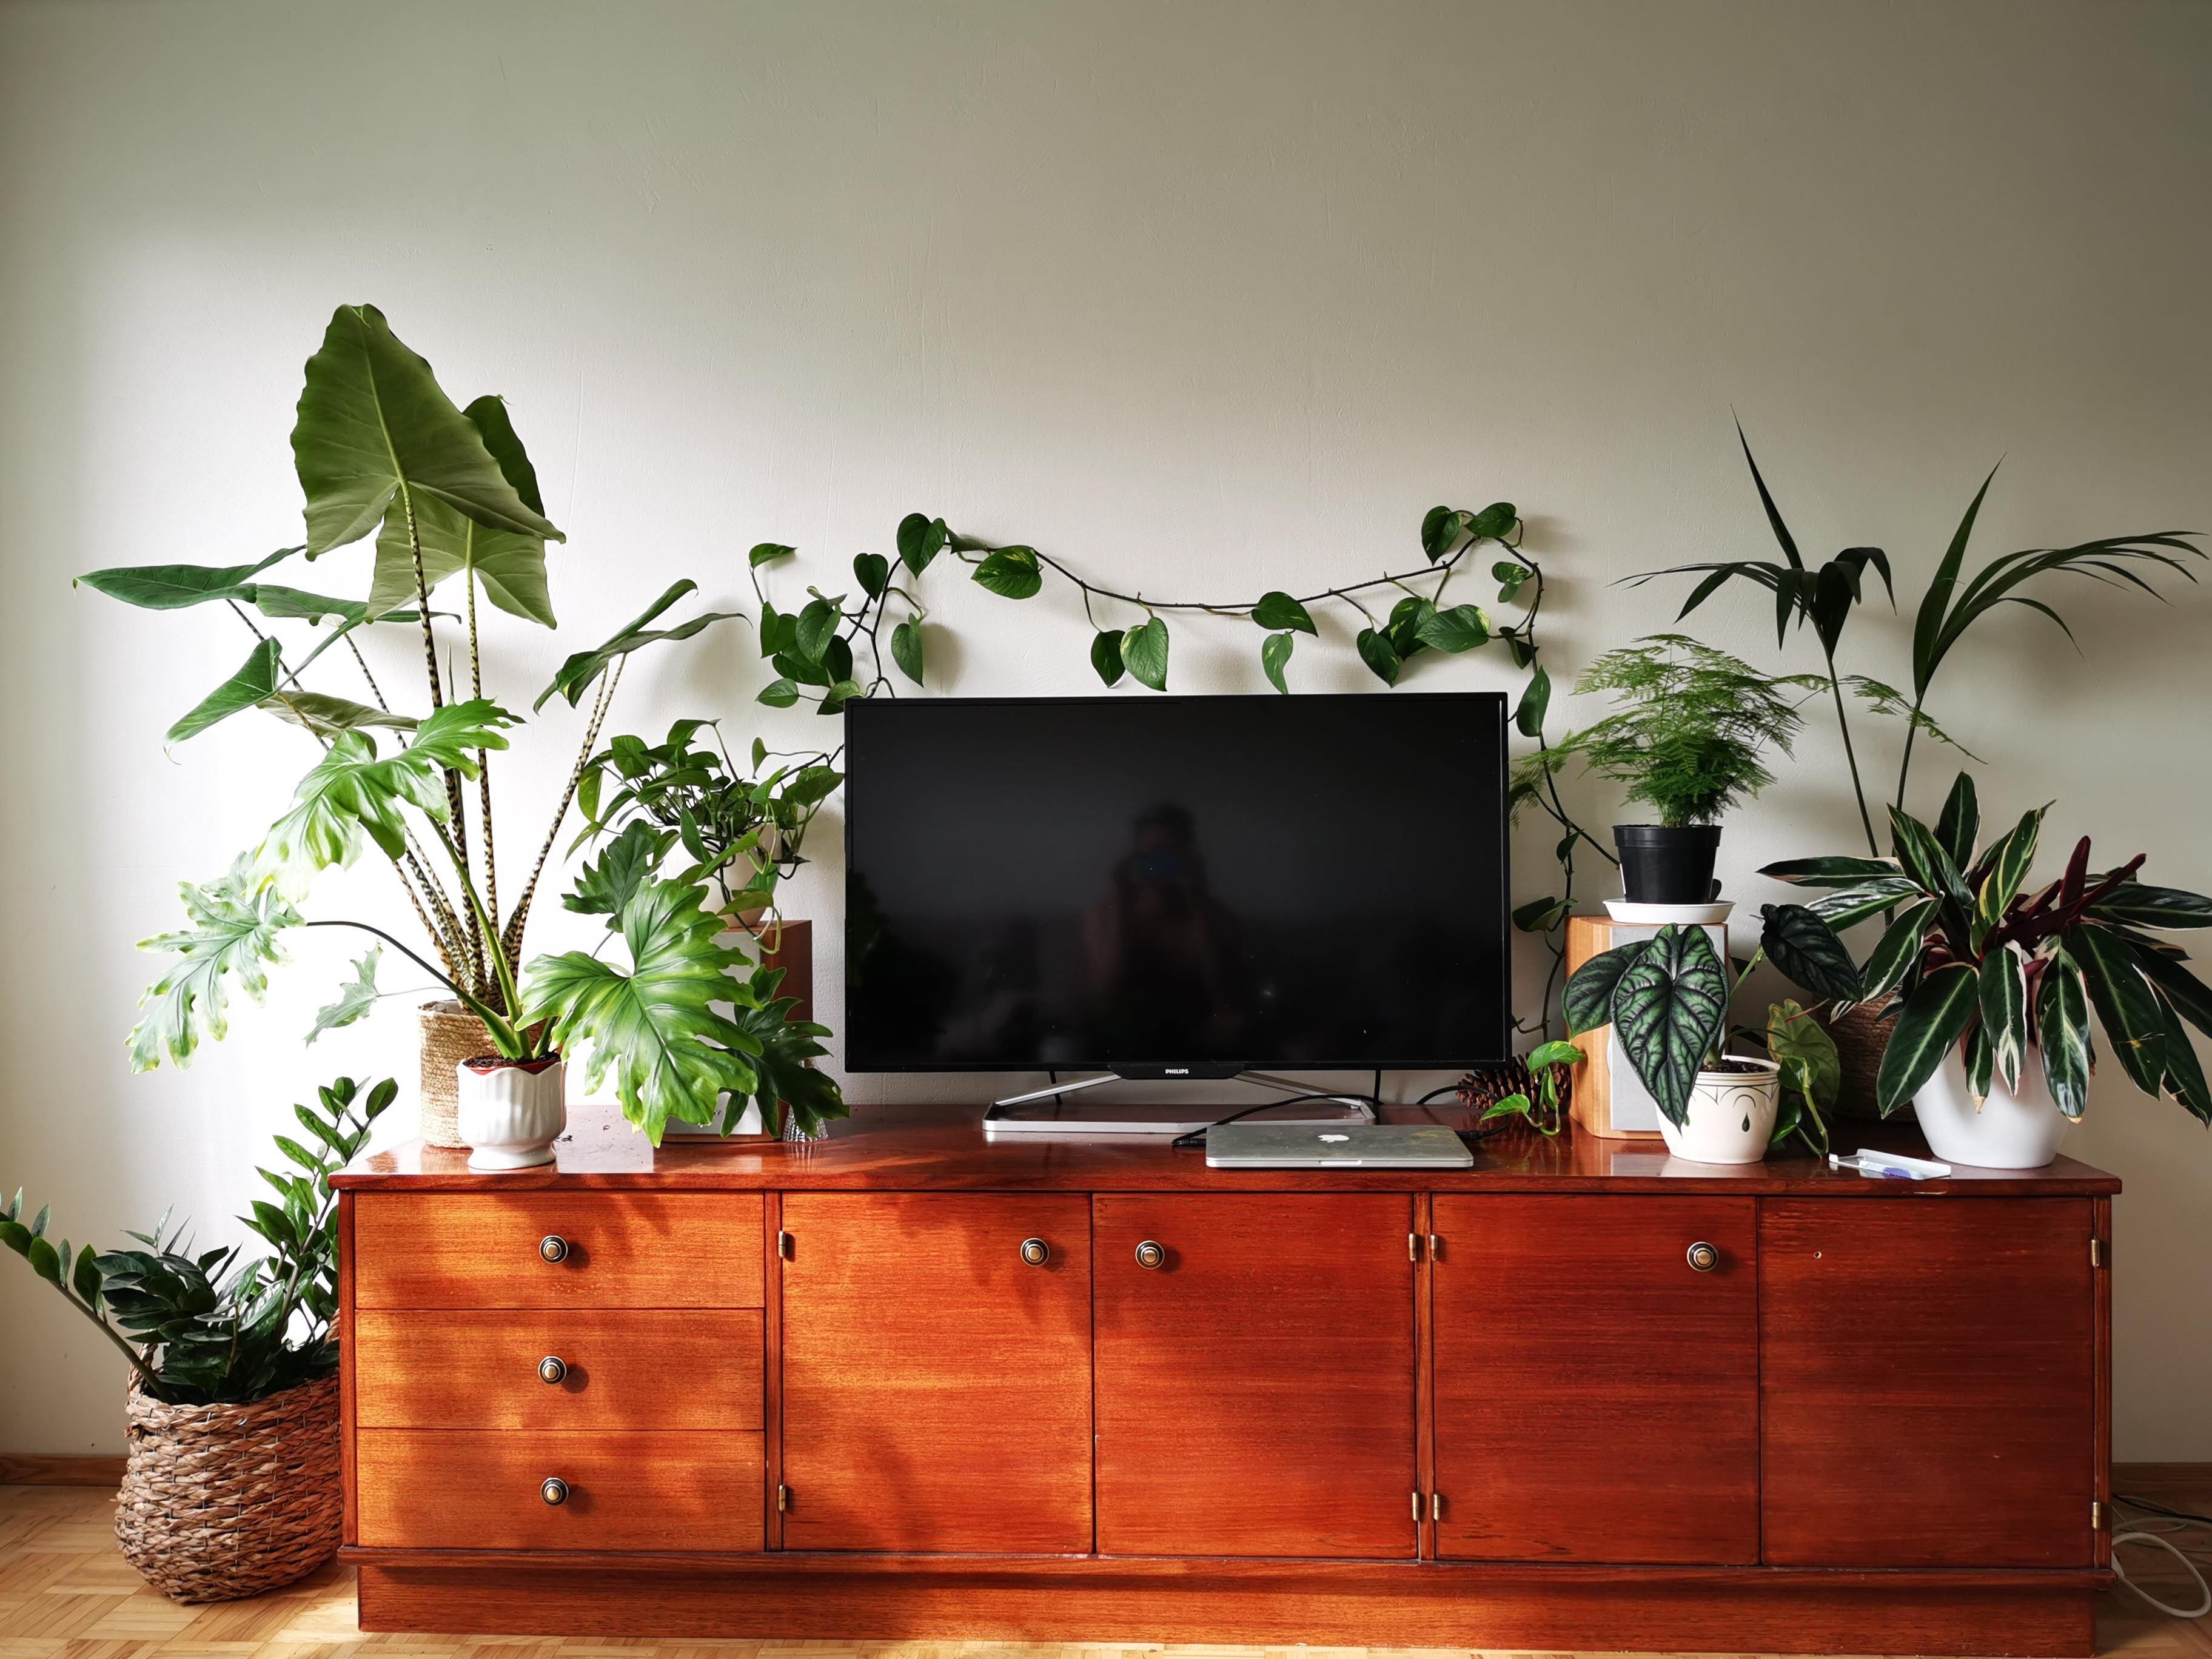 Tv Setup Plants Home And Living Flex Room Tv In Bedroom